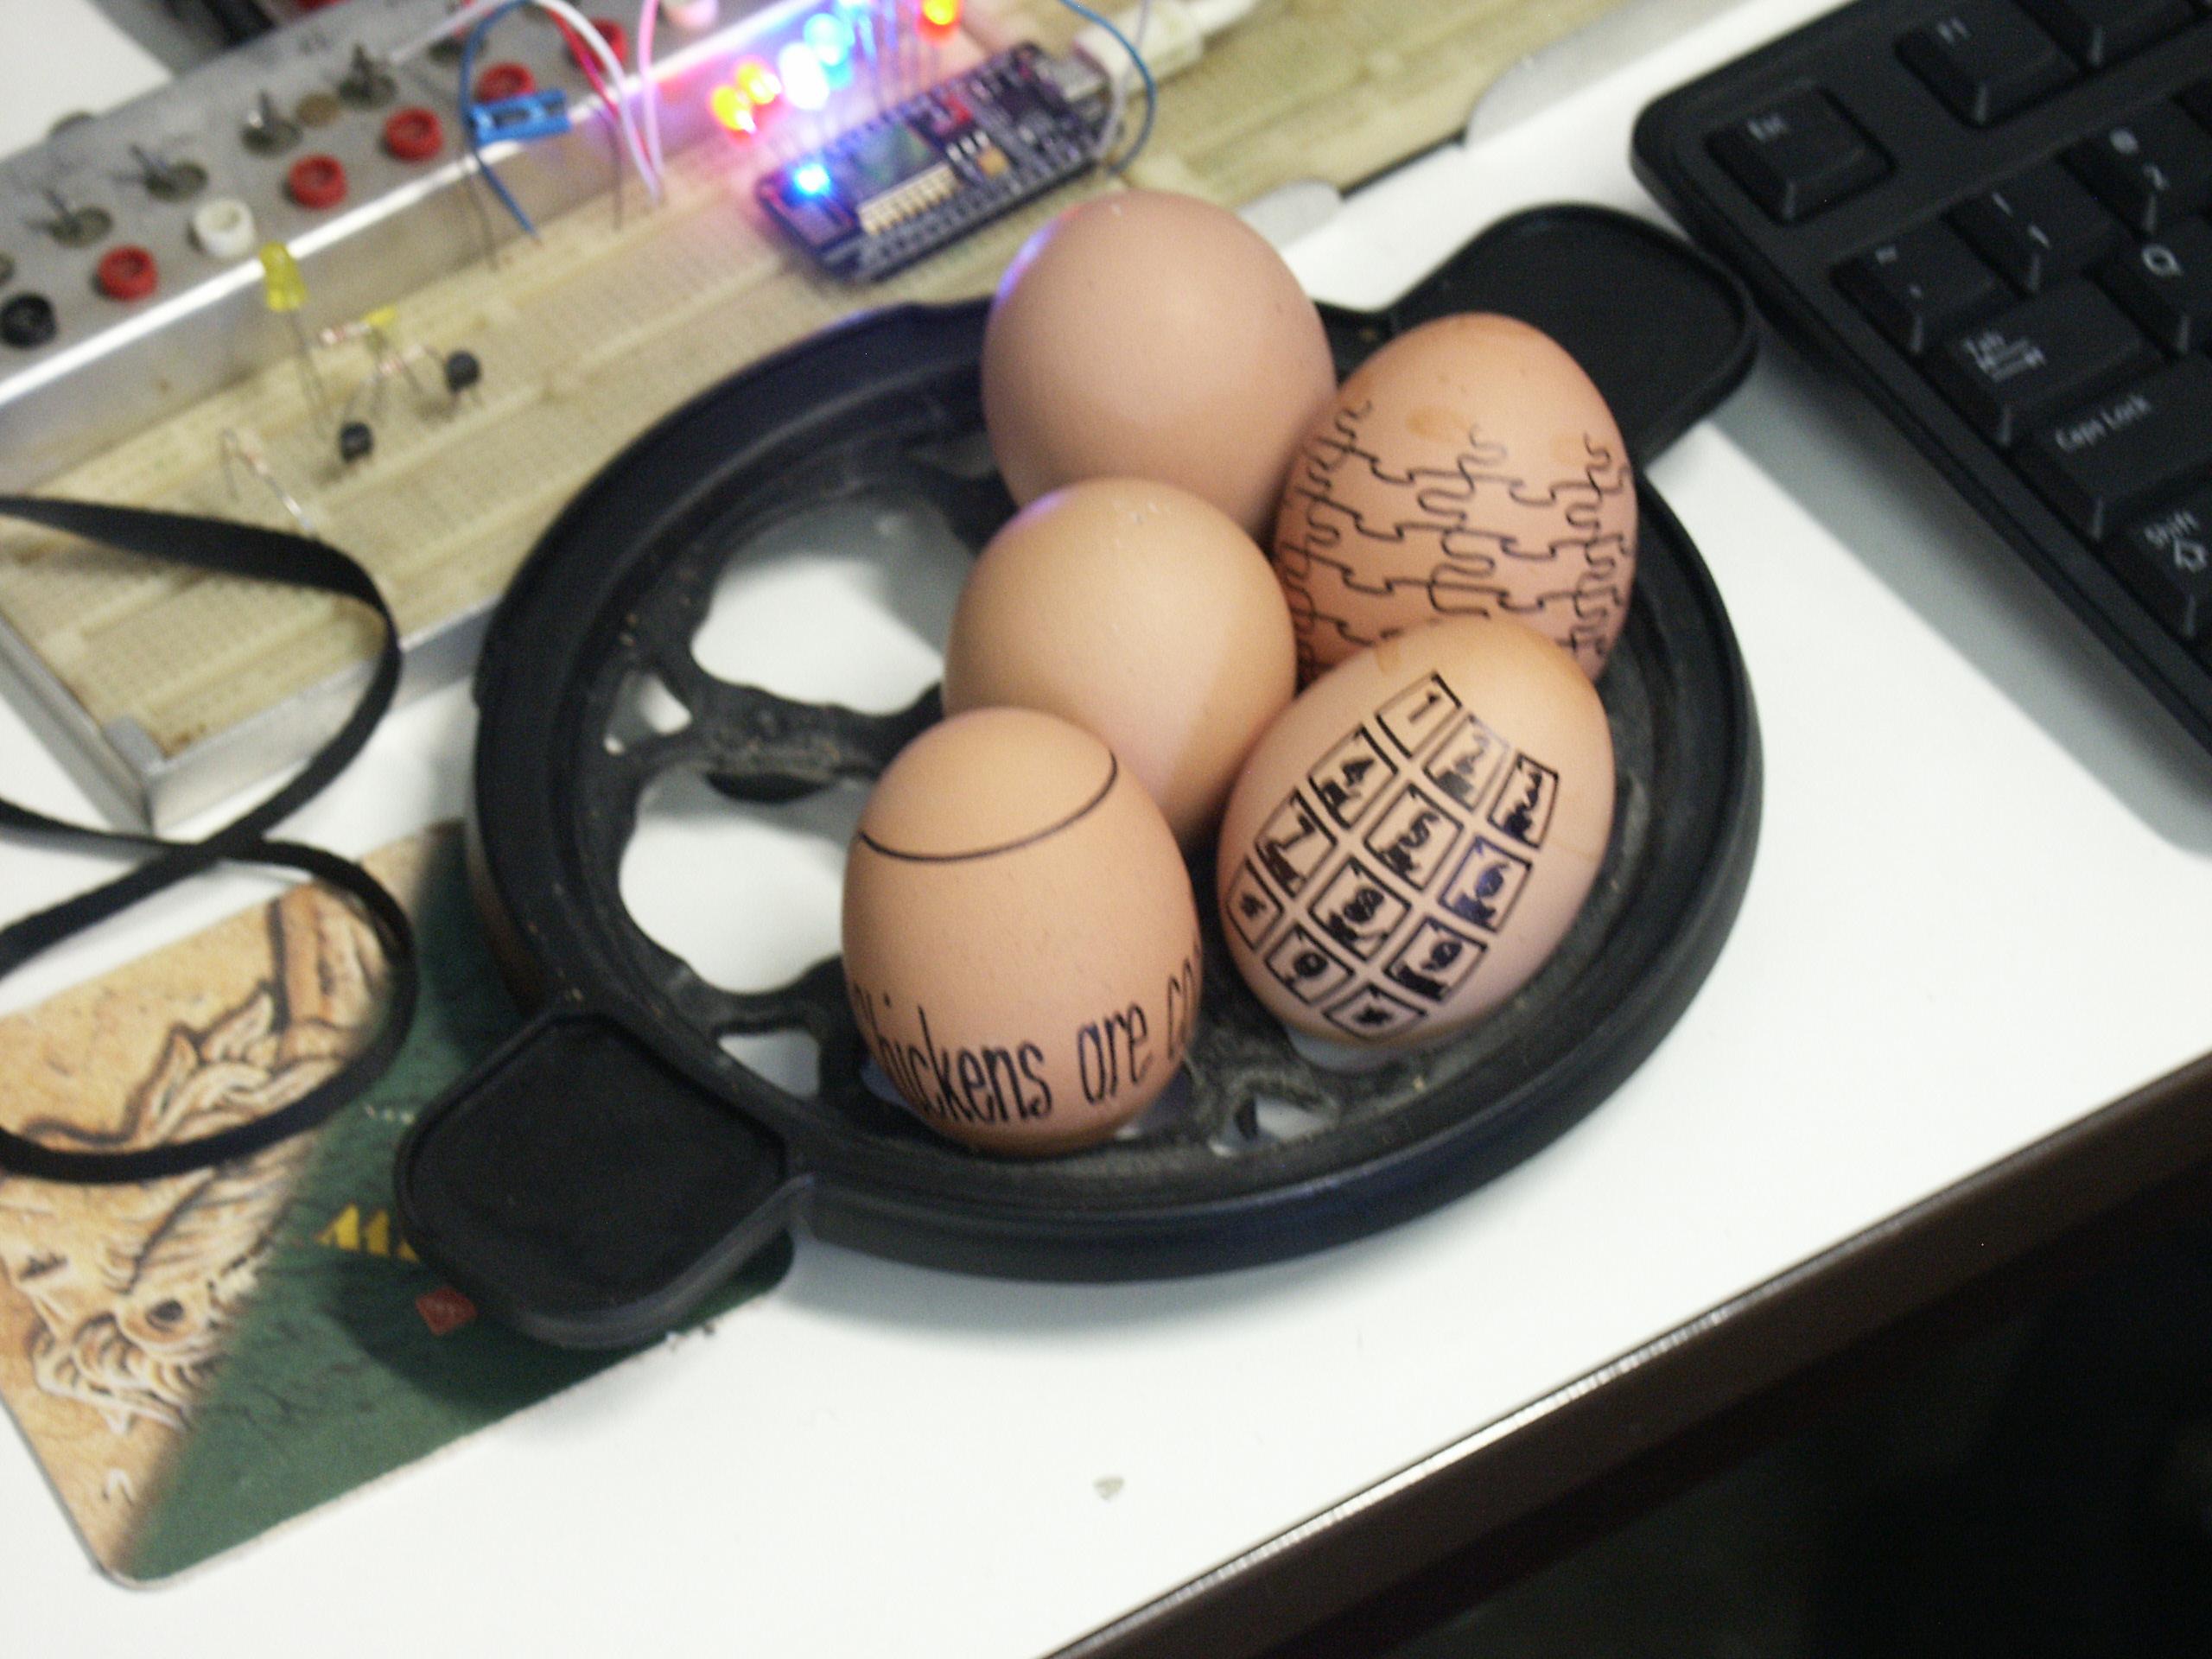 Resultaat eggbot